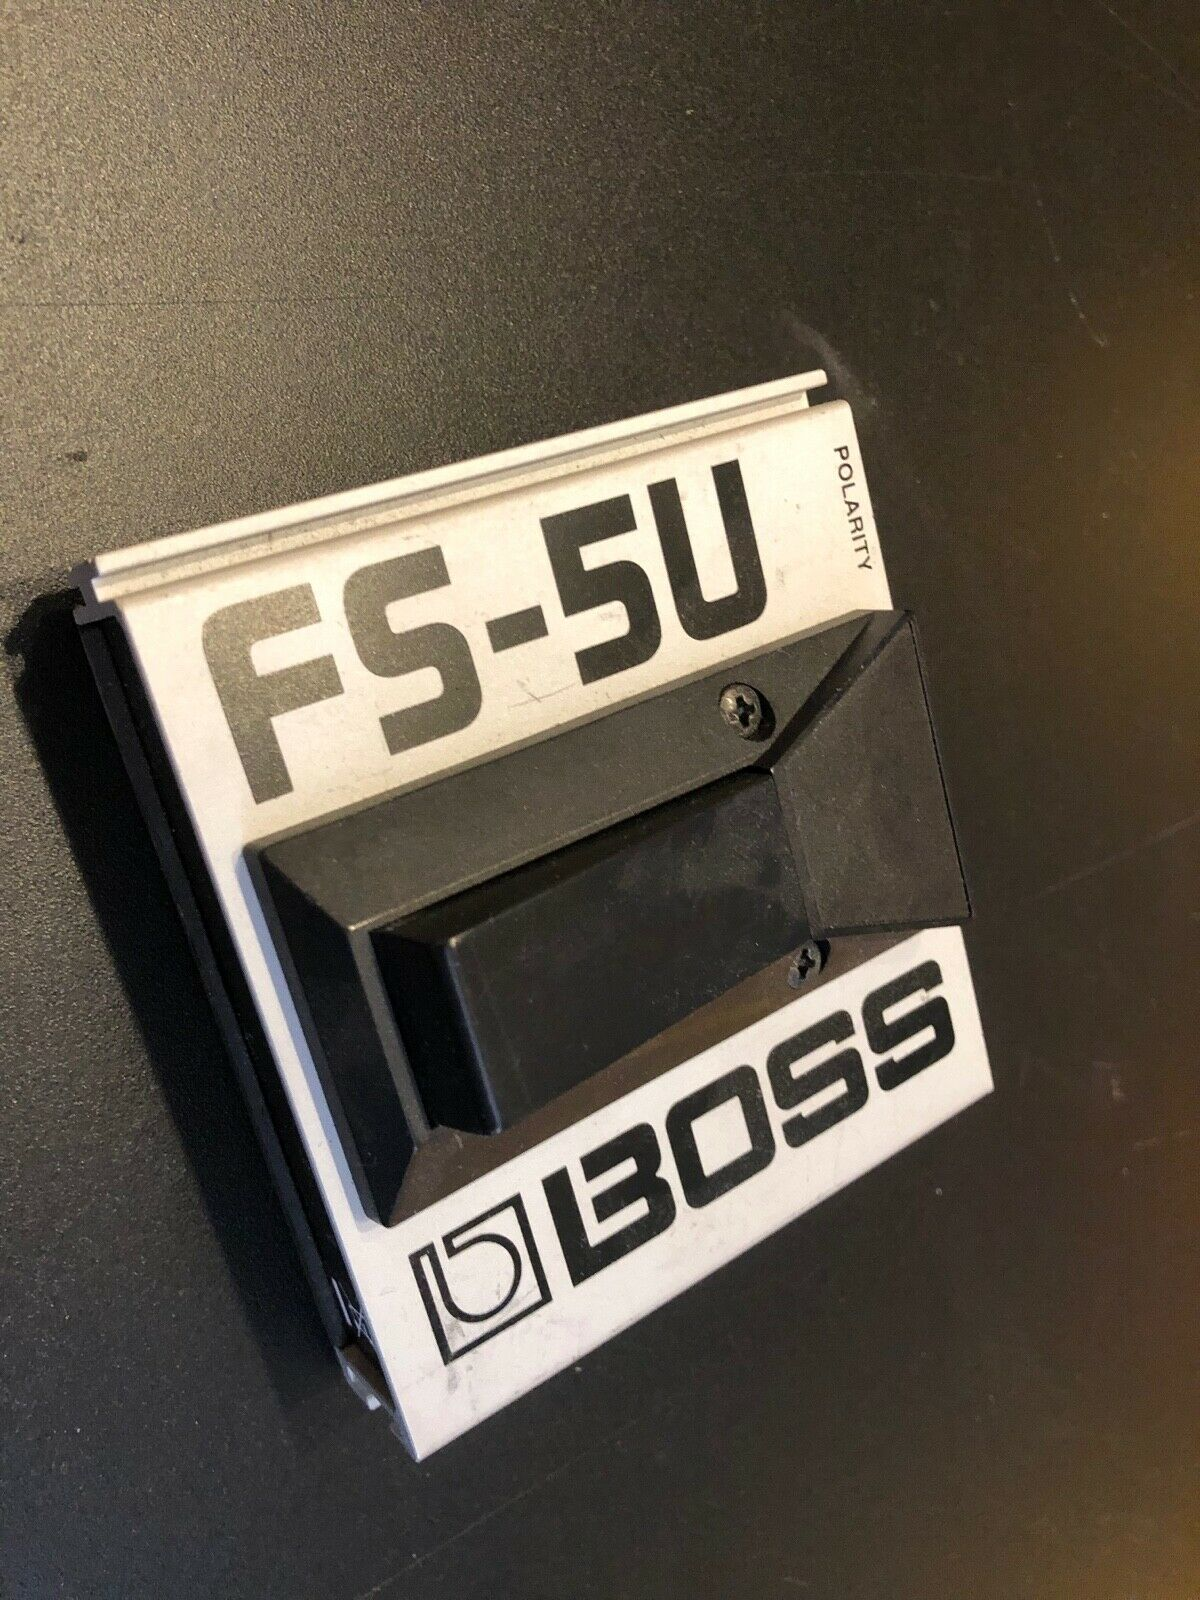 Boss FS-5U Foot Switch Controller Guitar Bass Keyboard Effect Pedal Used - $19.50